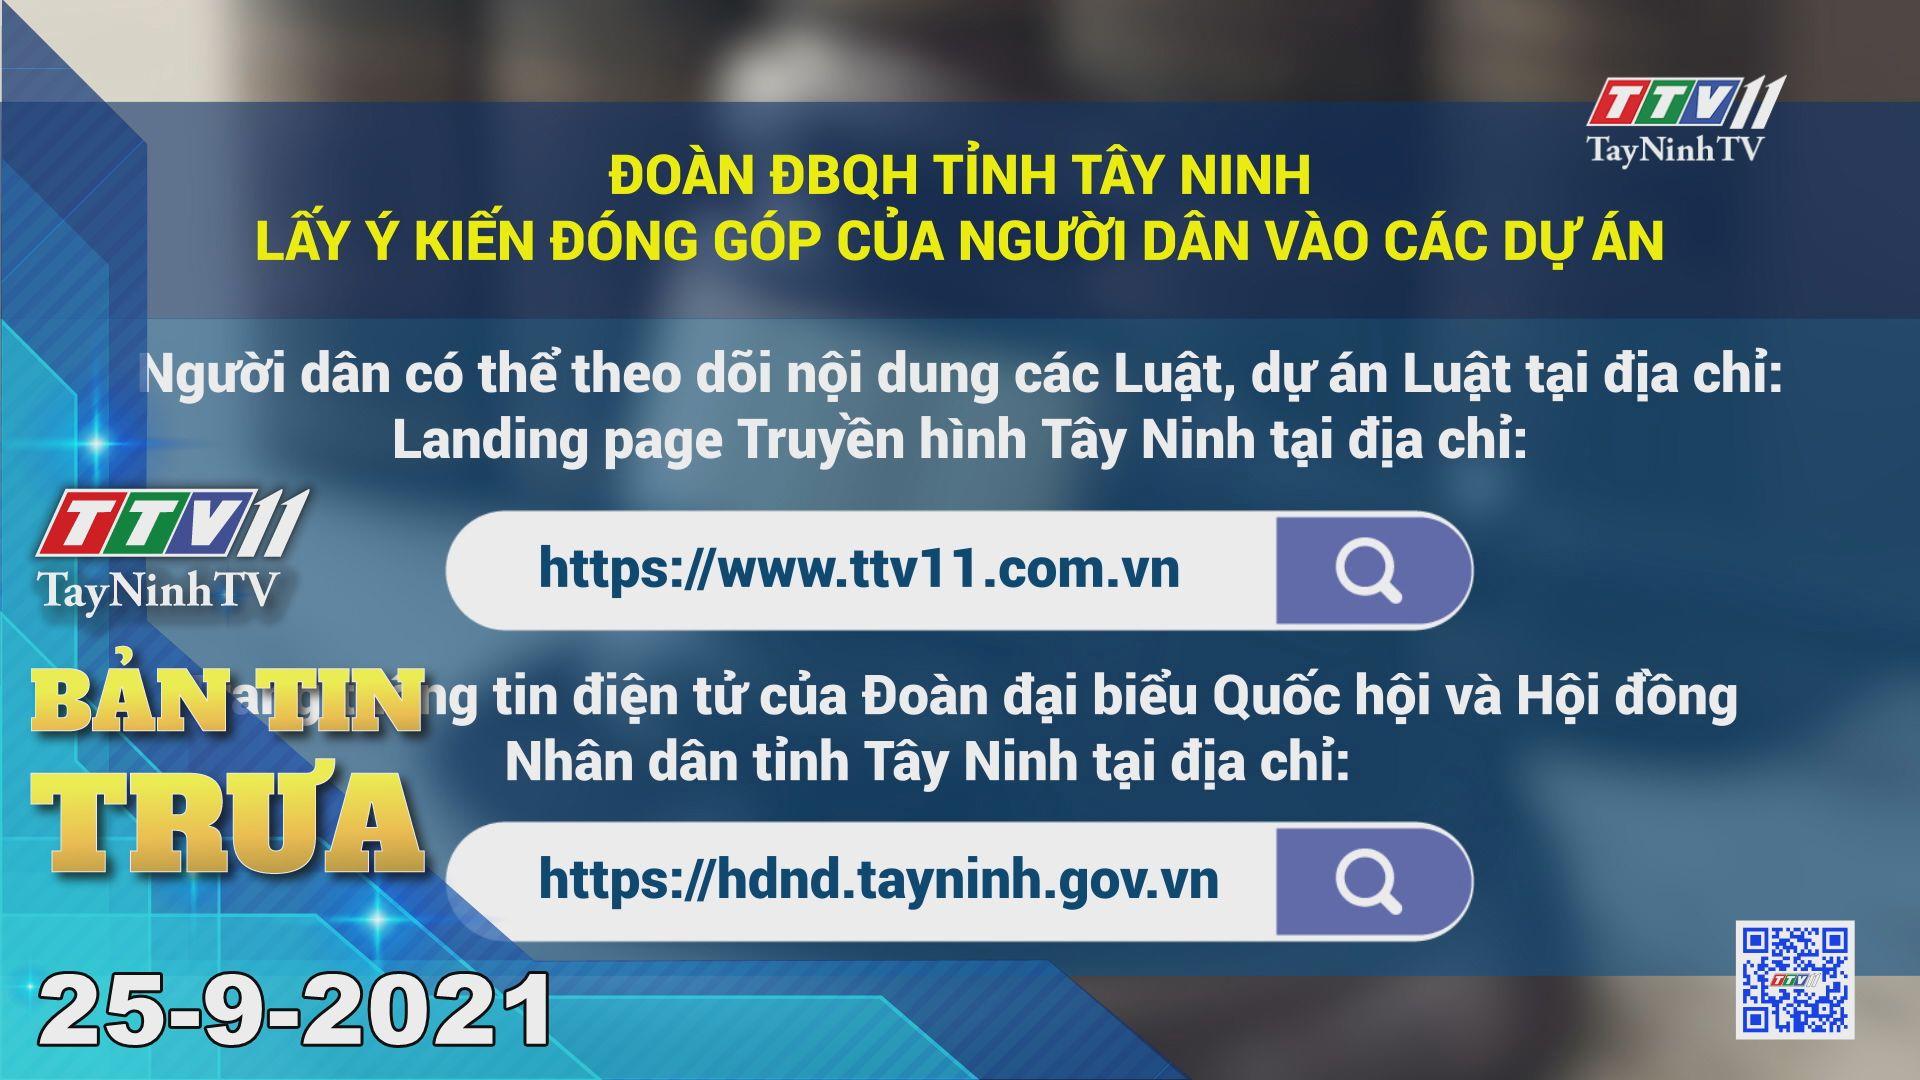 Bản tin trưa 25/9/2021 | Tin tức hôm nay | TayNinhTV